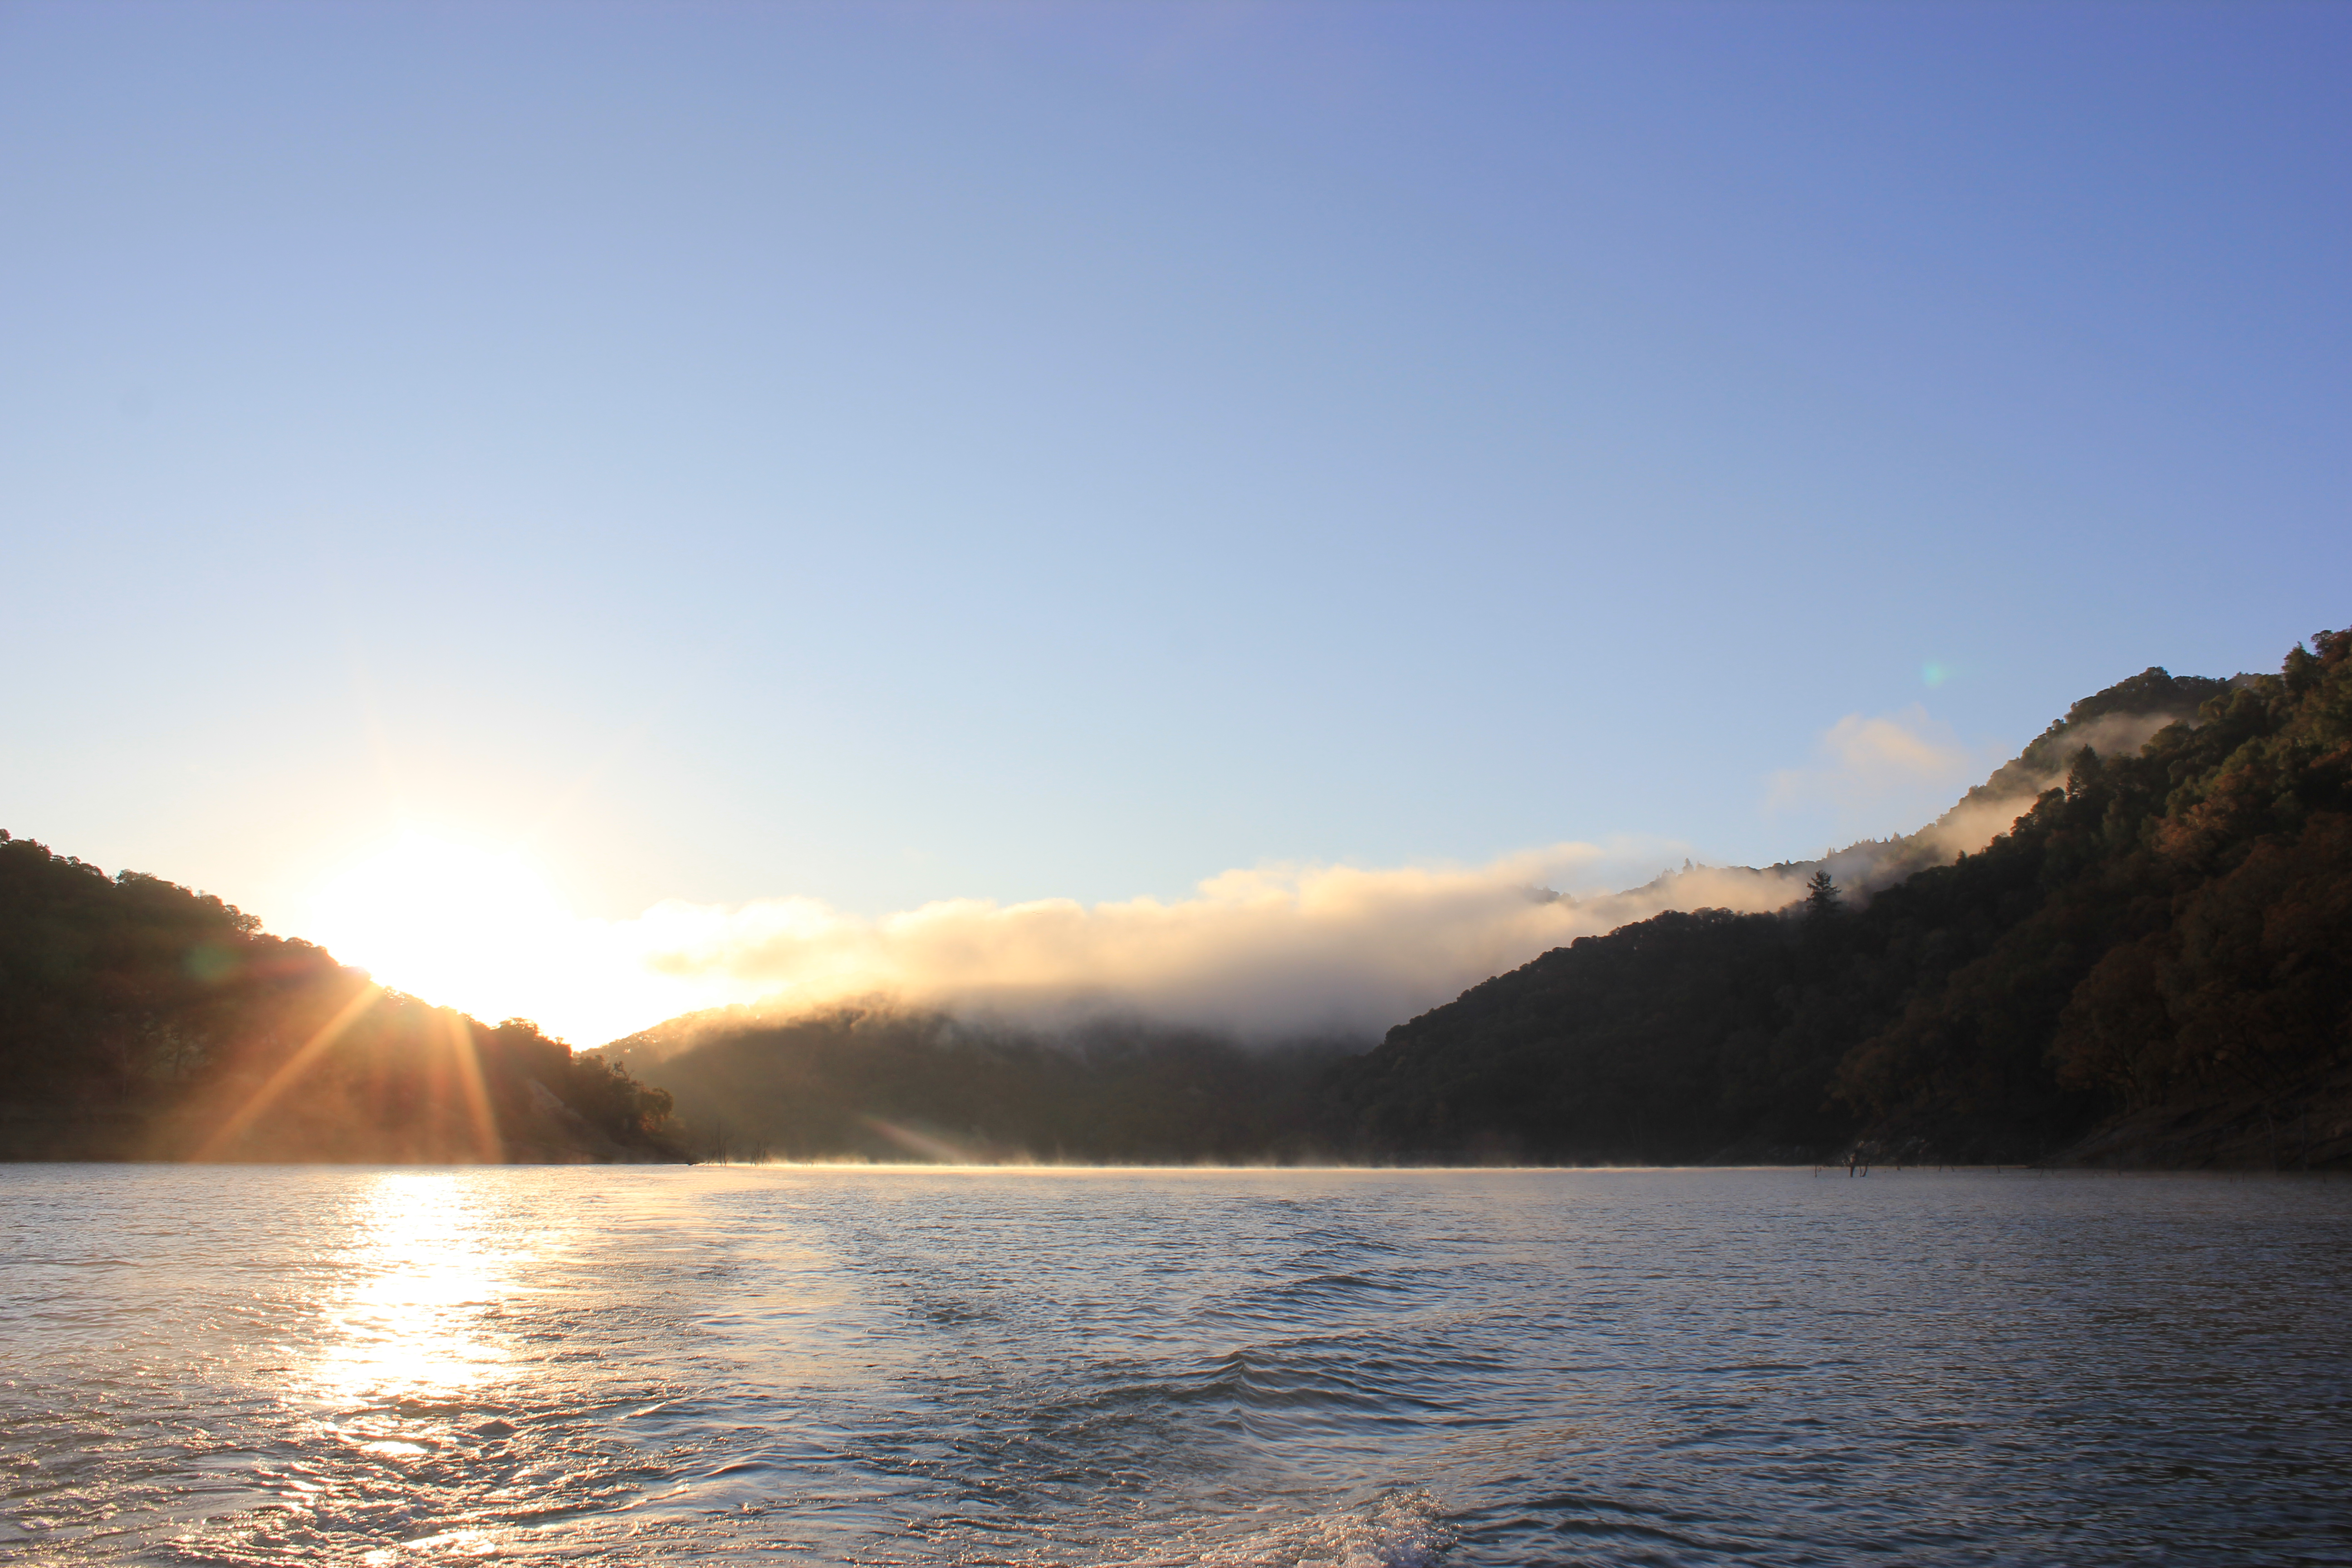 Lake Sonoma in Sonoma County, California